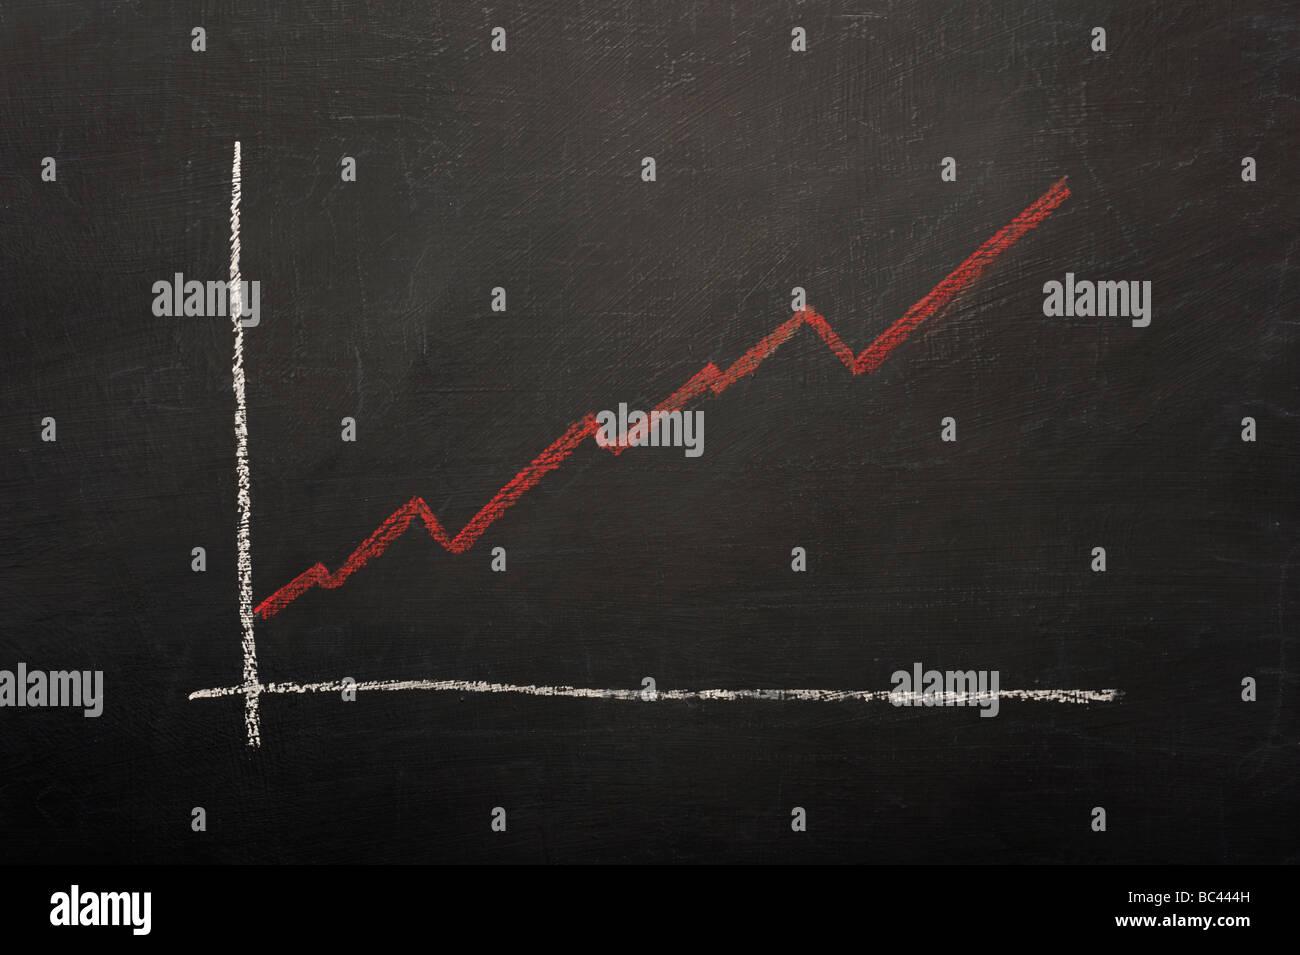 Blackboard - Stock Image